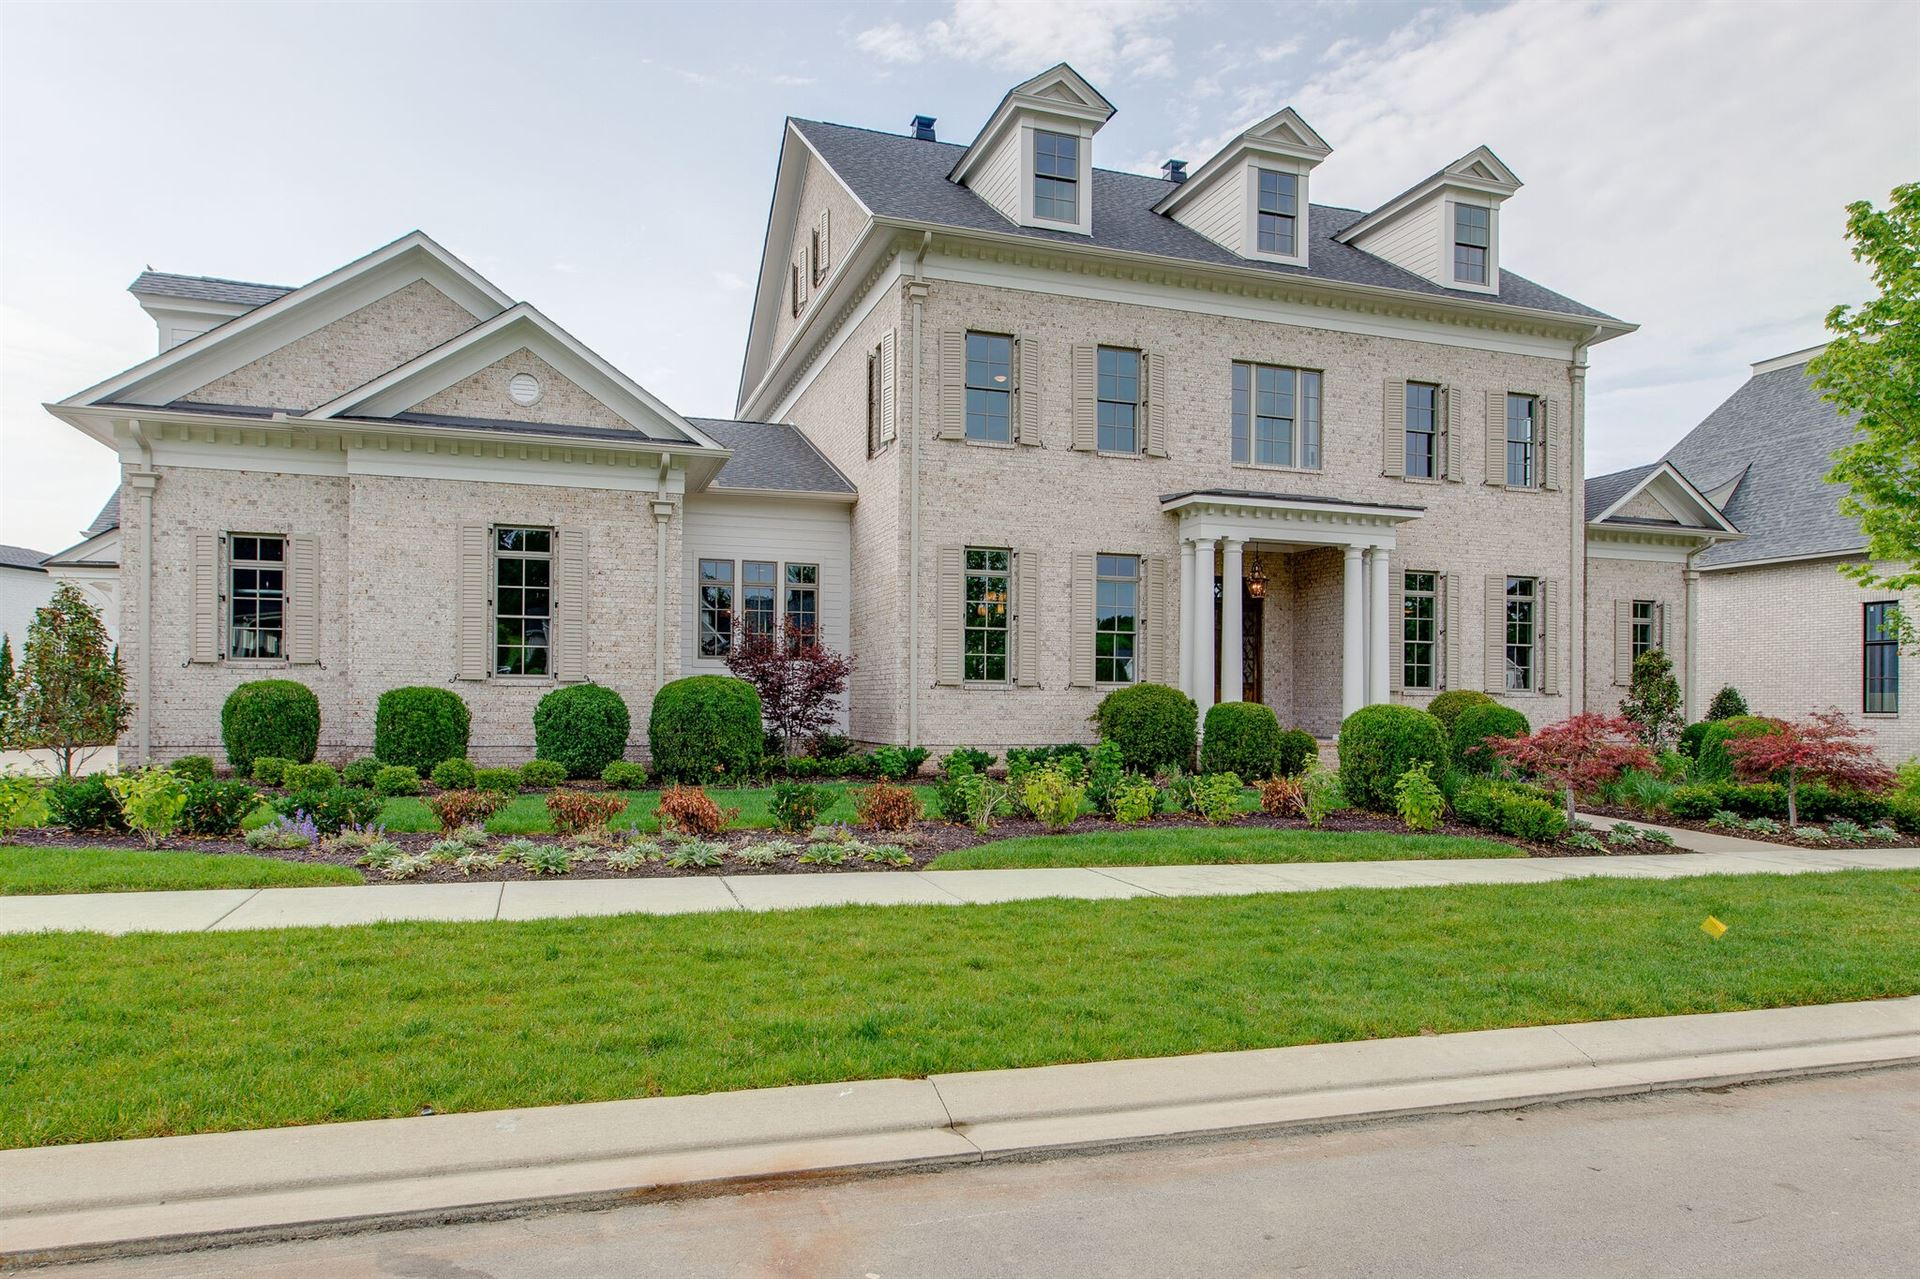 8308 Shoreline Court (Lot 8002), College Grove, TN 37046 - MLS#: 2136863